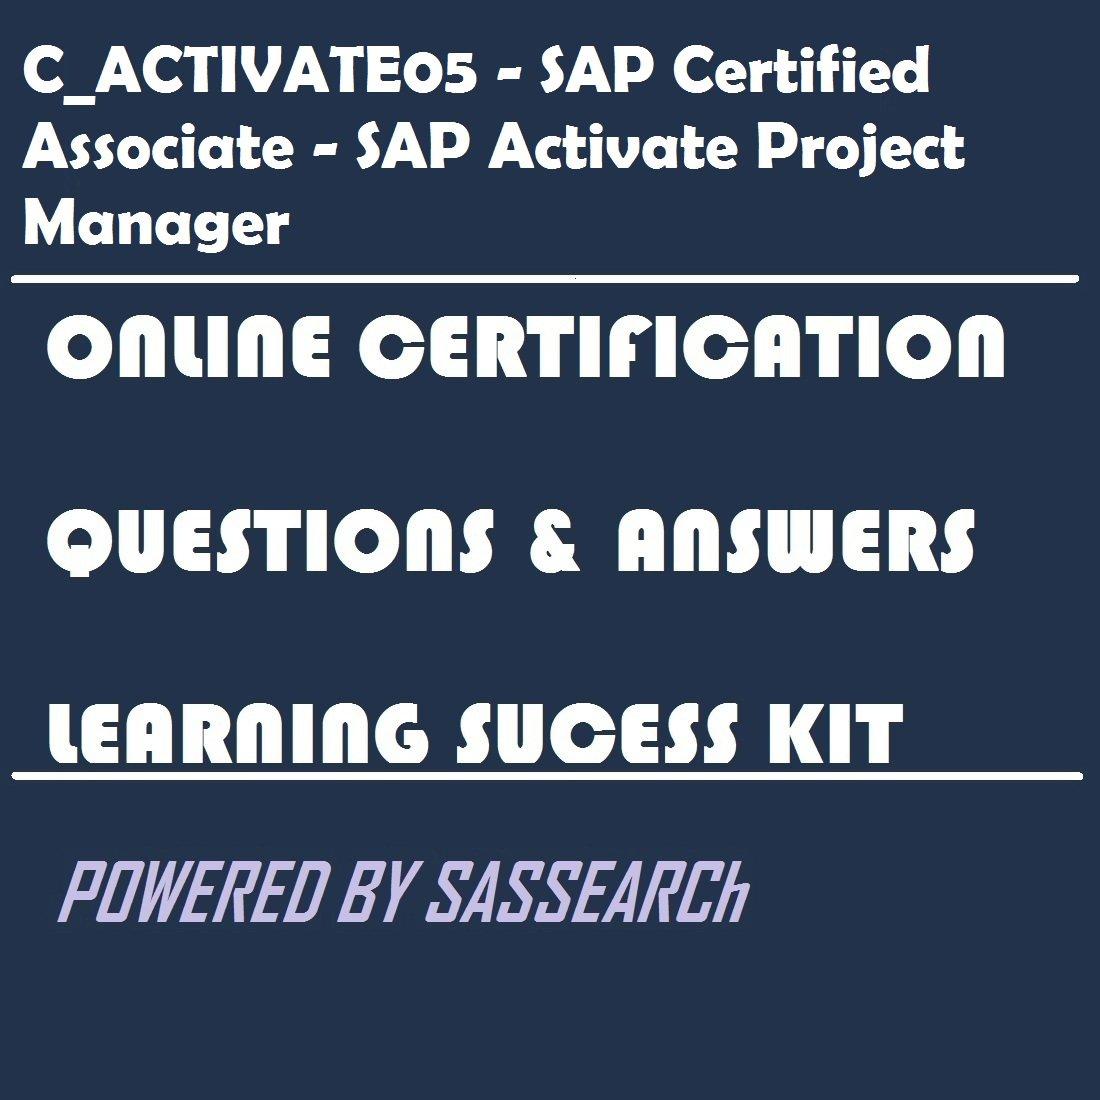 Amazon Cactivate05 Sap Certified Associate Sap Activate